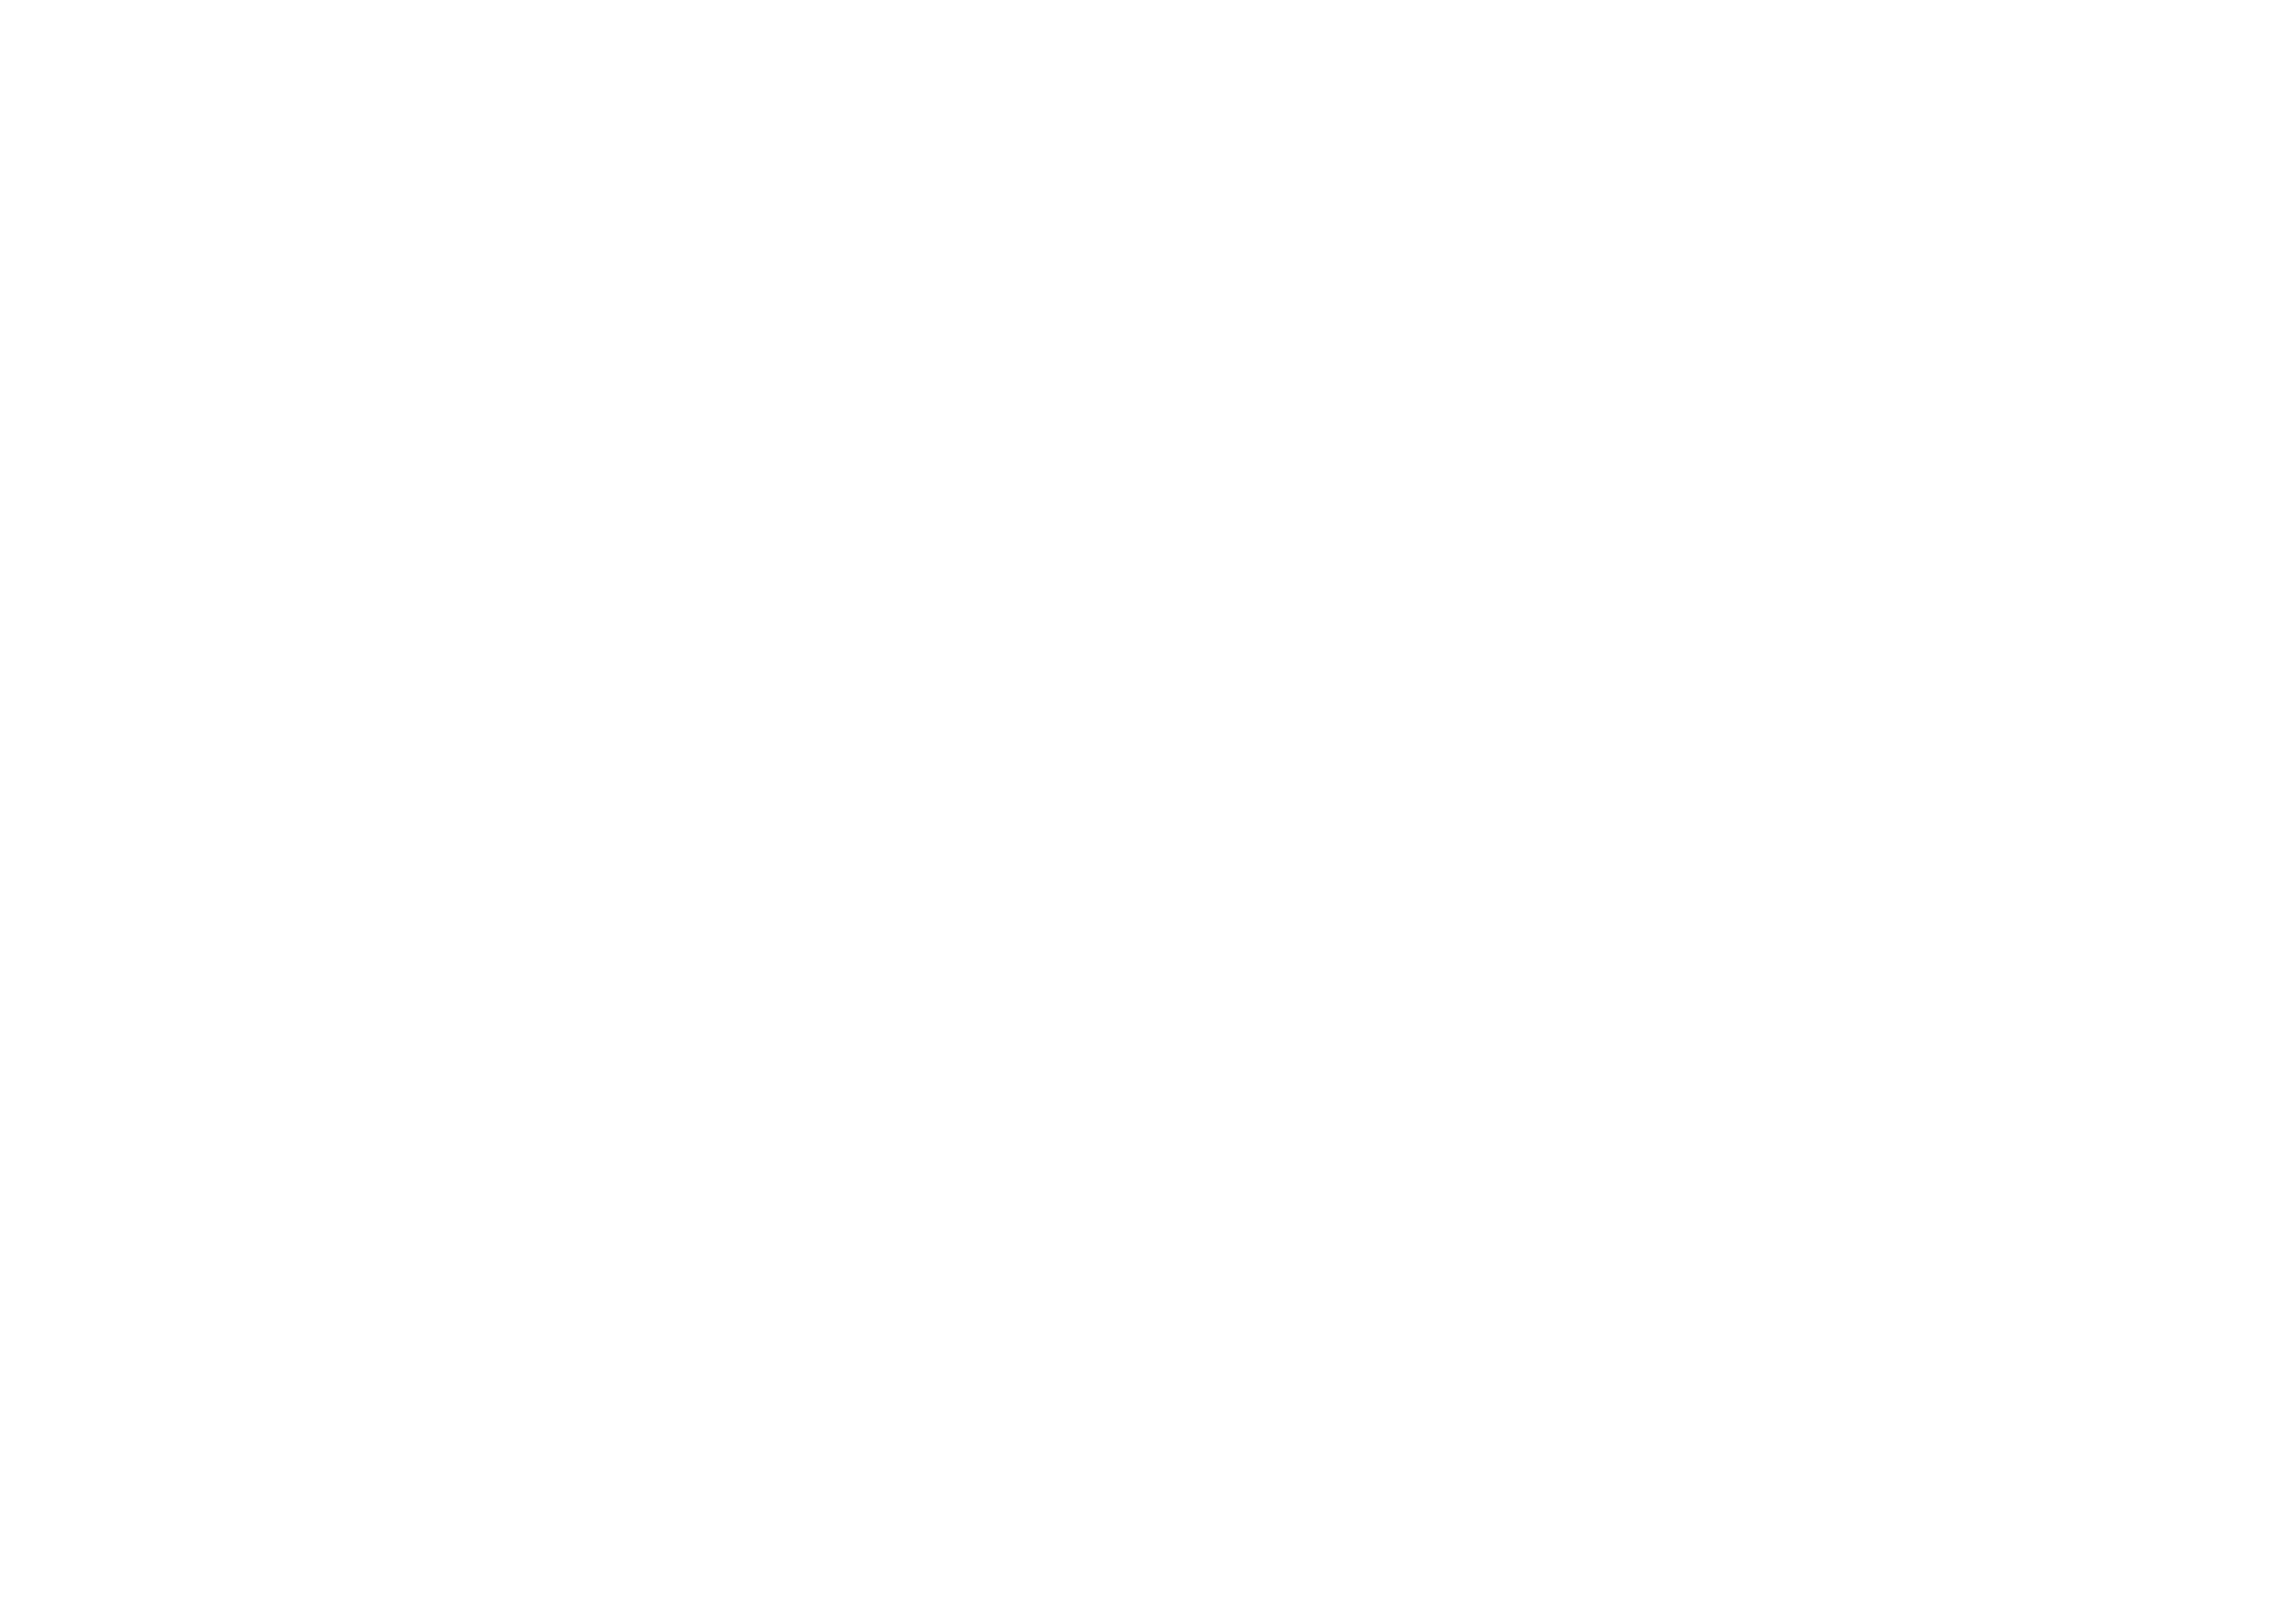 gravure-brasserie